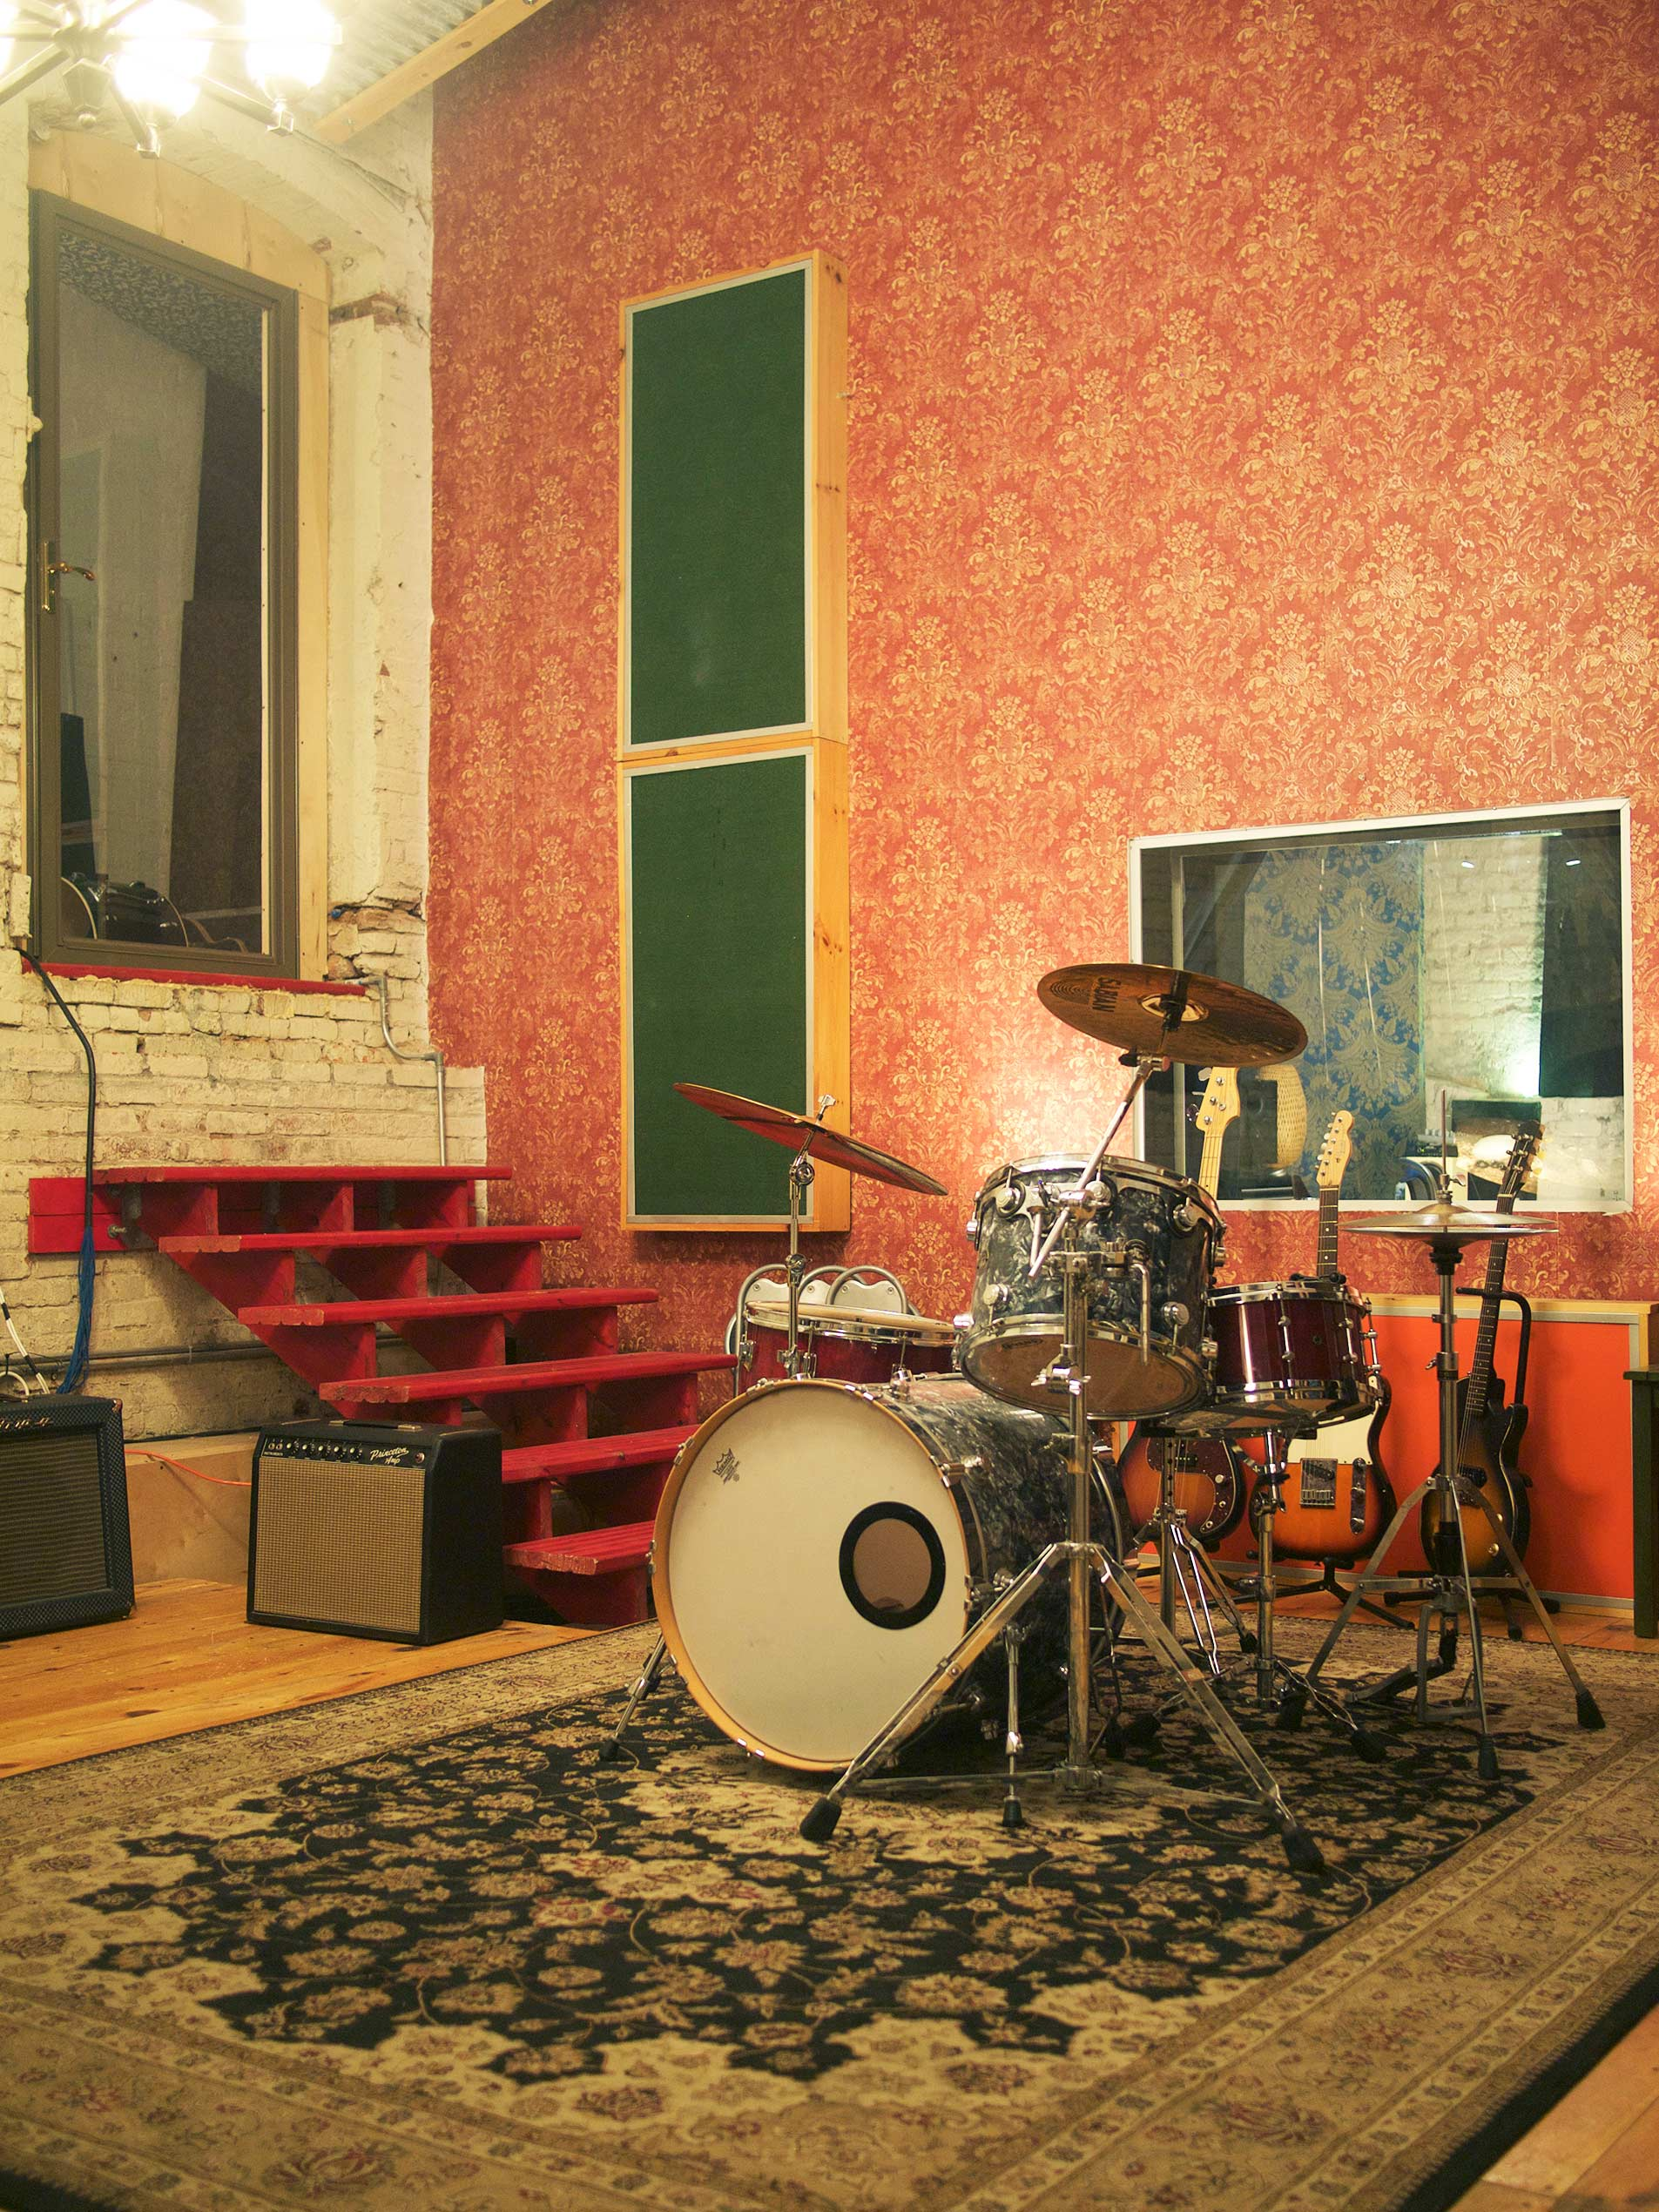 post-dumbo-vinegar-hill-sound-drums-2x